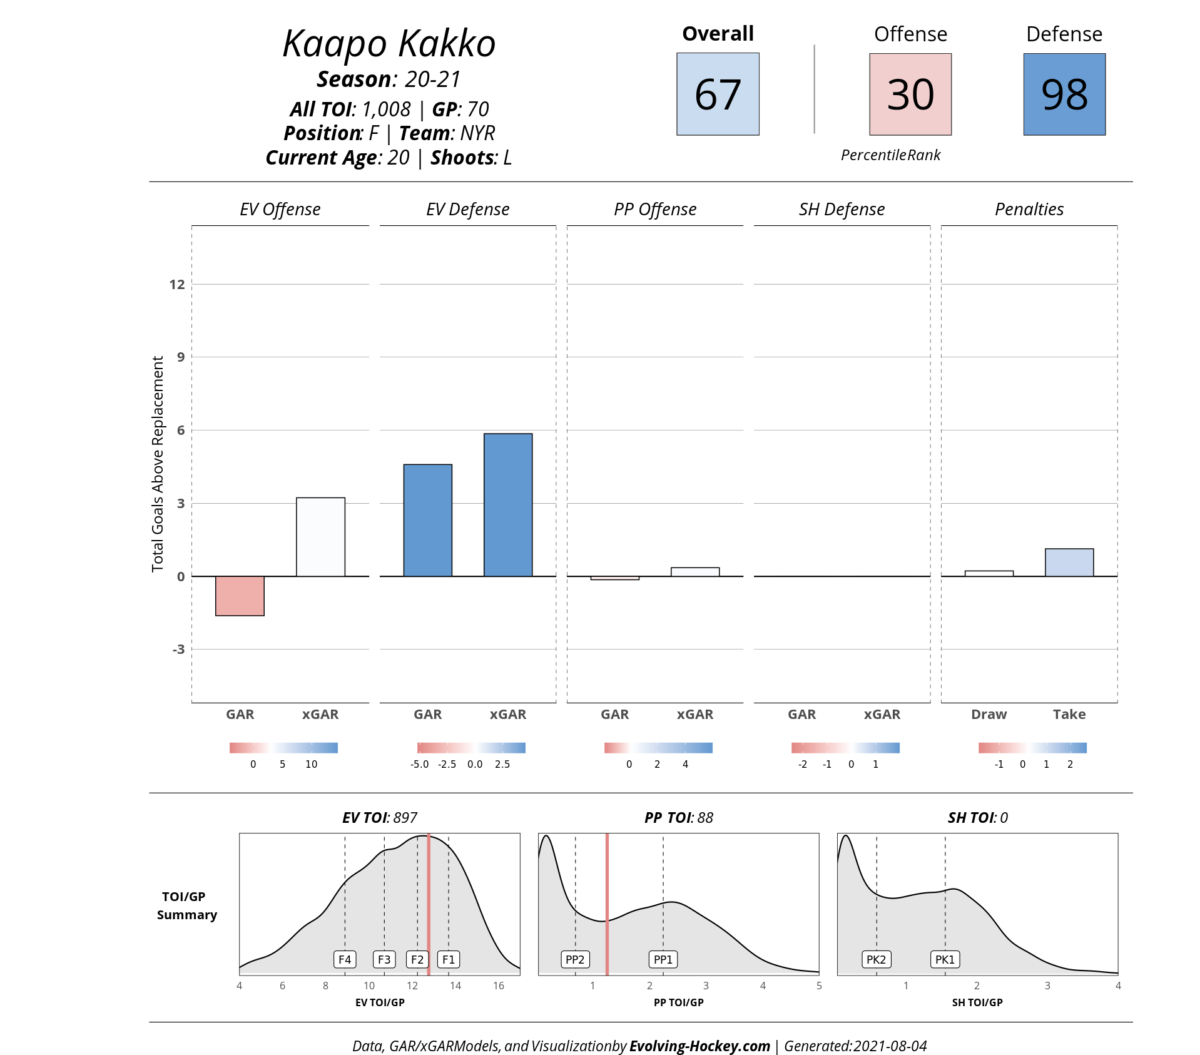 Kaapo Kakko Evolving Hockey Card